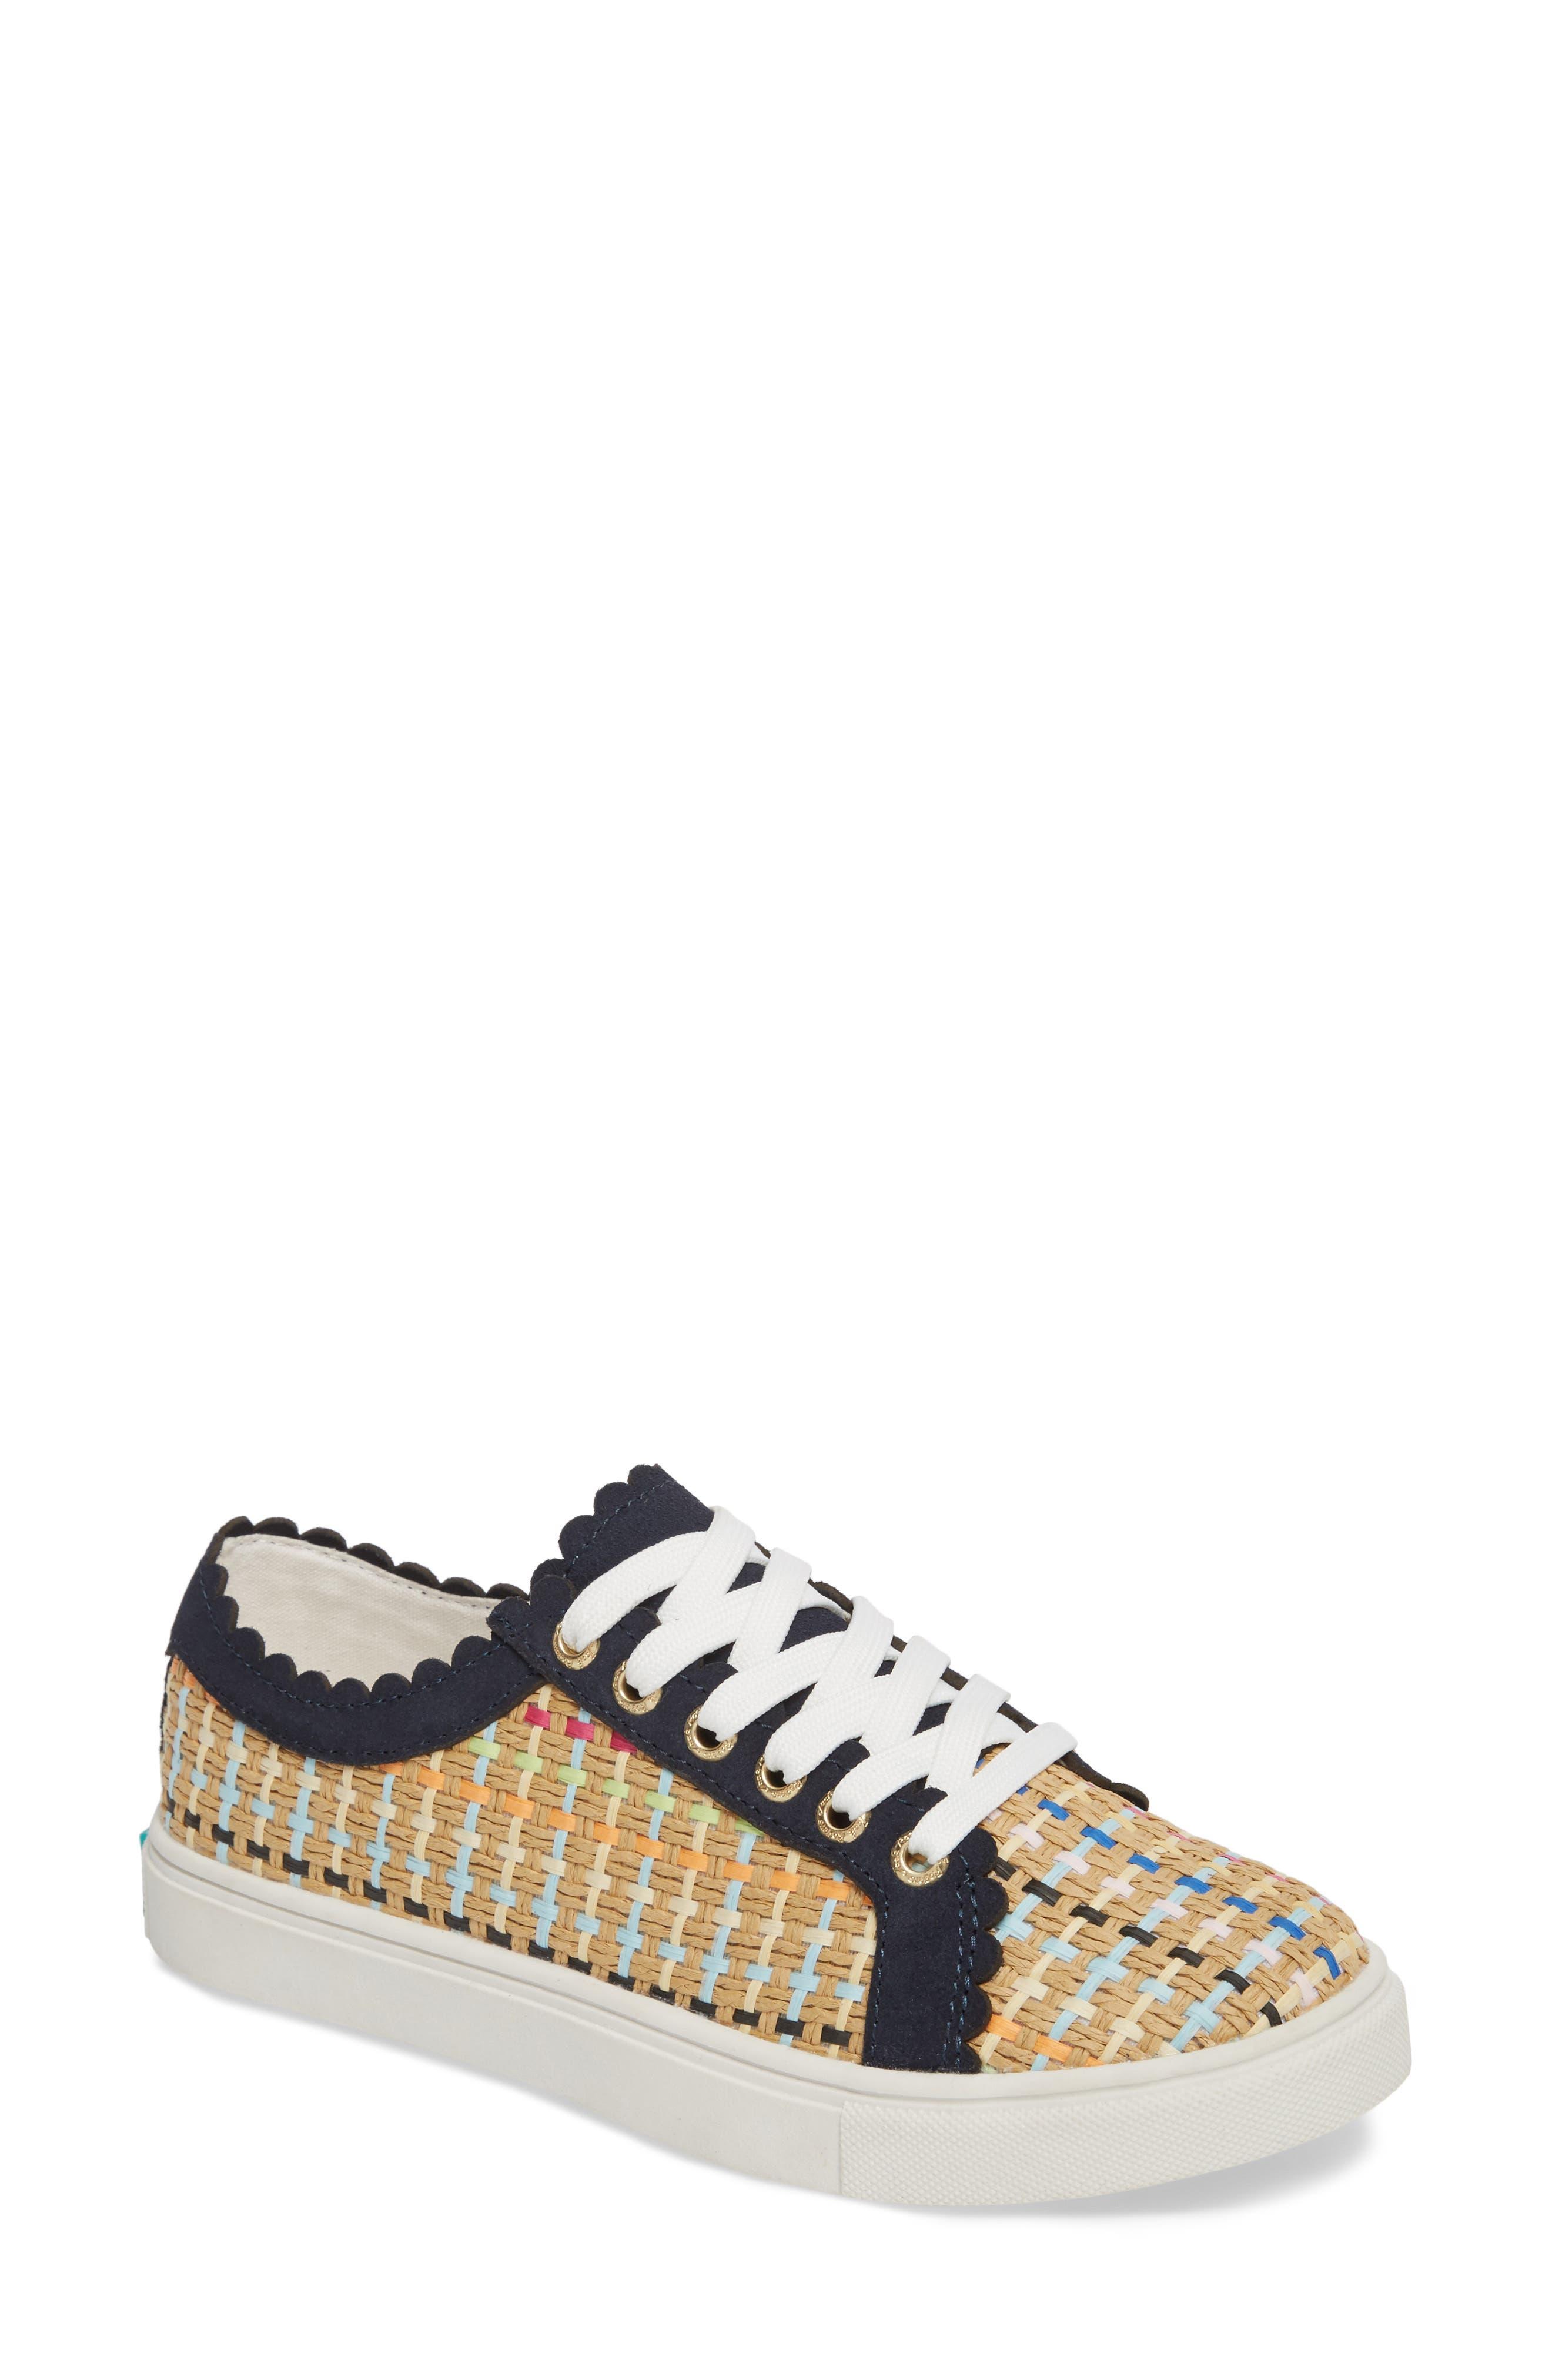 Teagan Sneaker,                         Main,                         color, Multi Combo